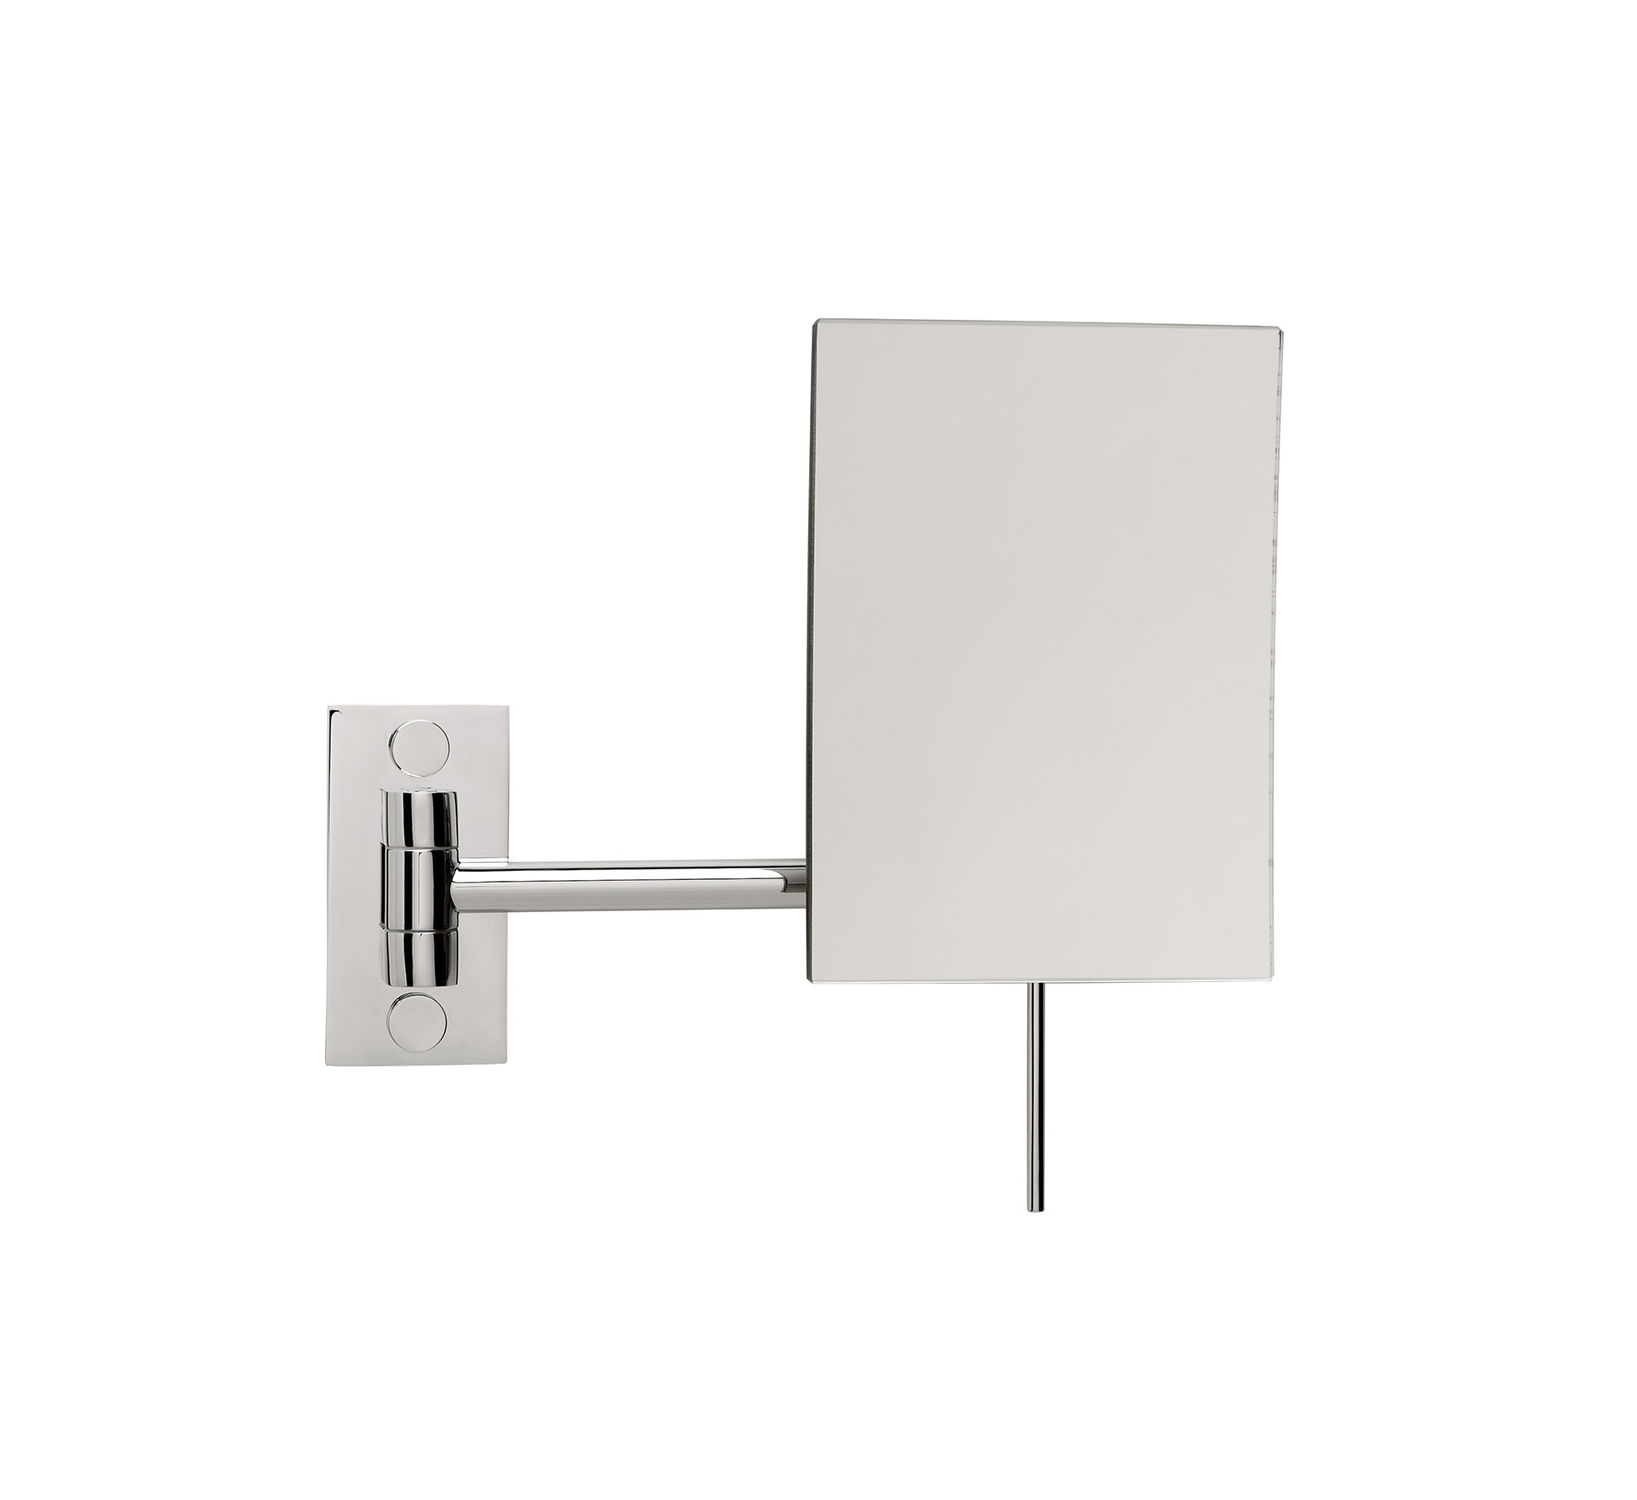 Bathroom Magnifying Mirror Wall Mountedbest magnifying mirror for bathroom 9designsemporium